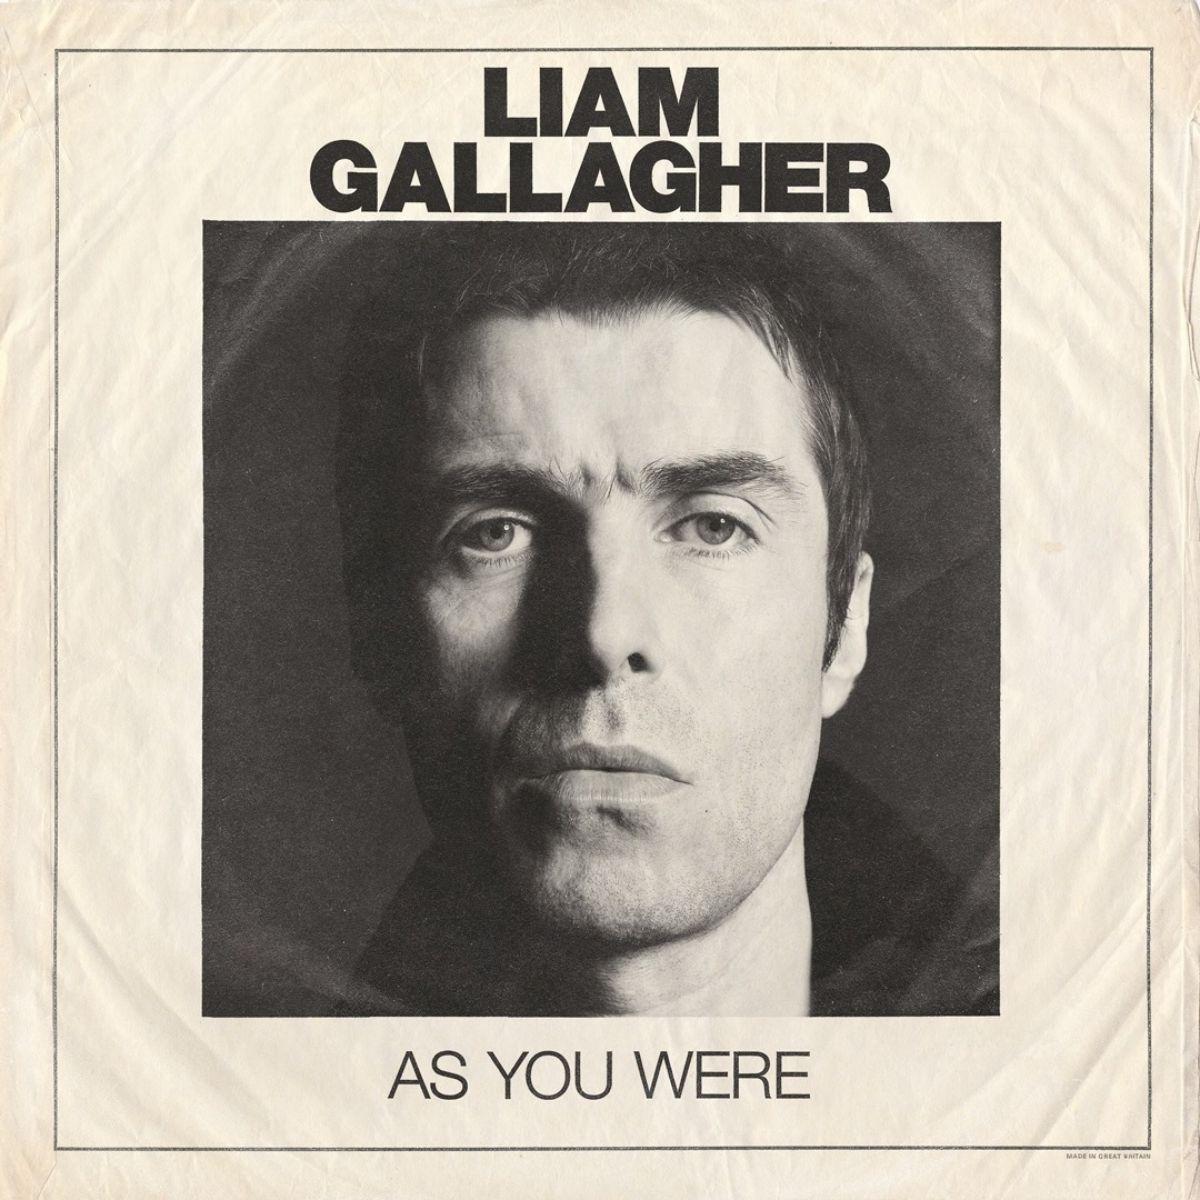 As you were. Foto: Facebook